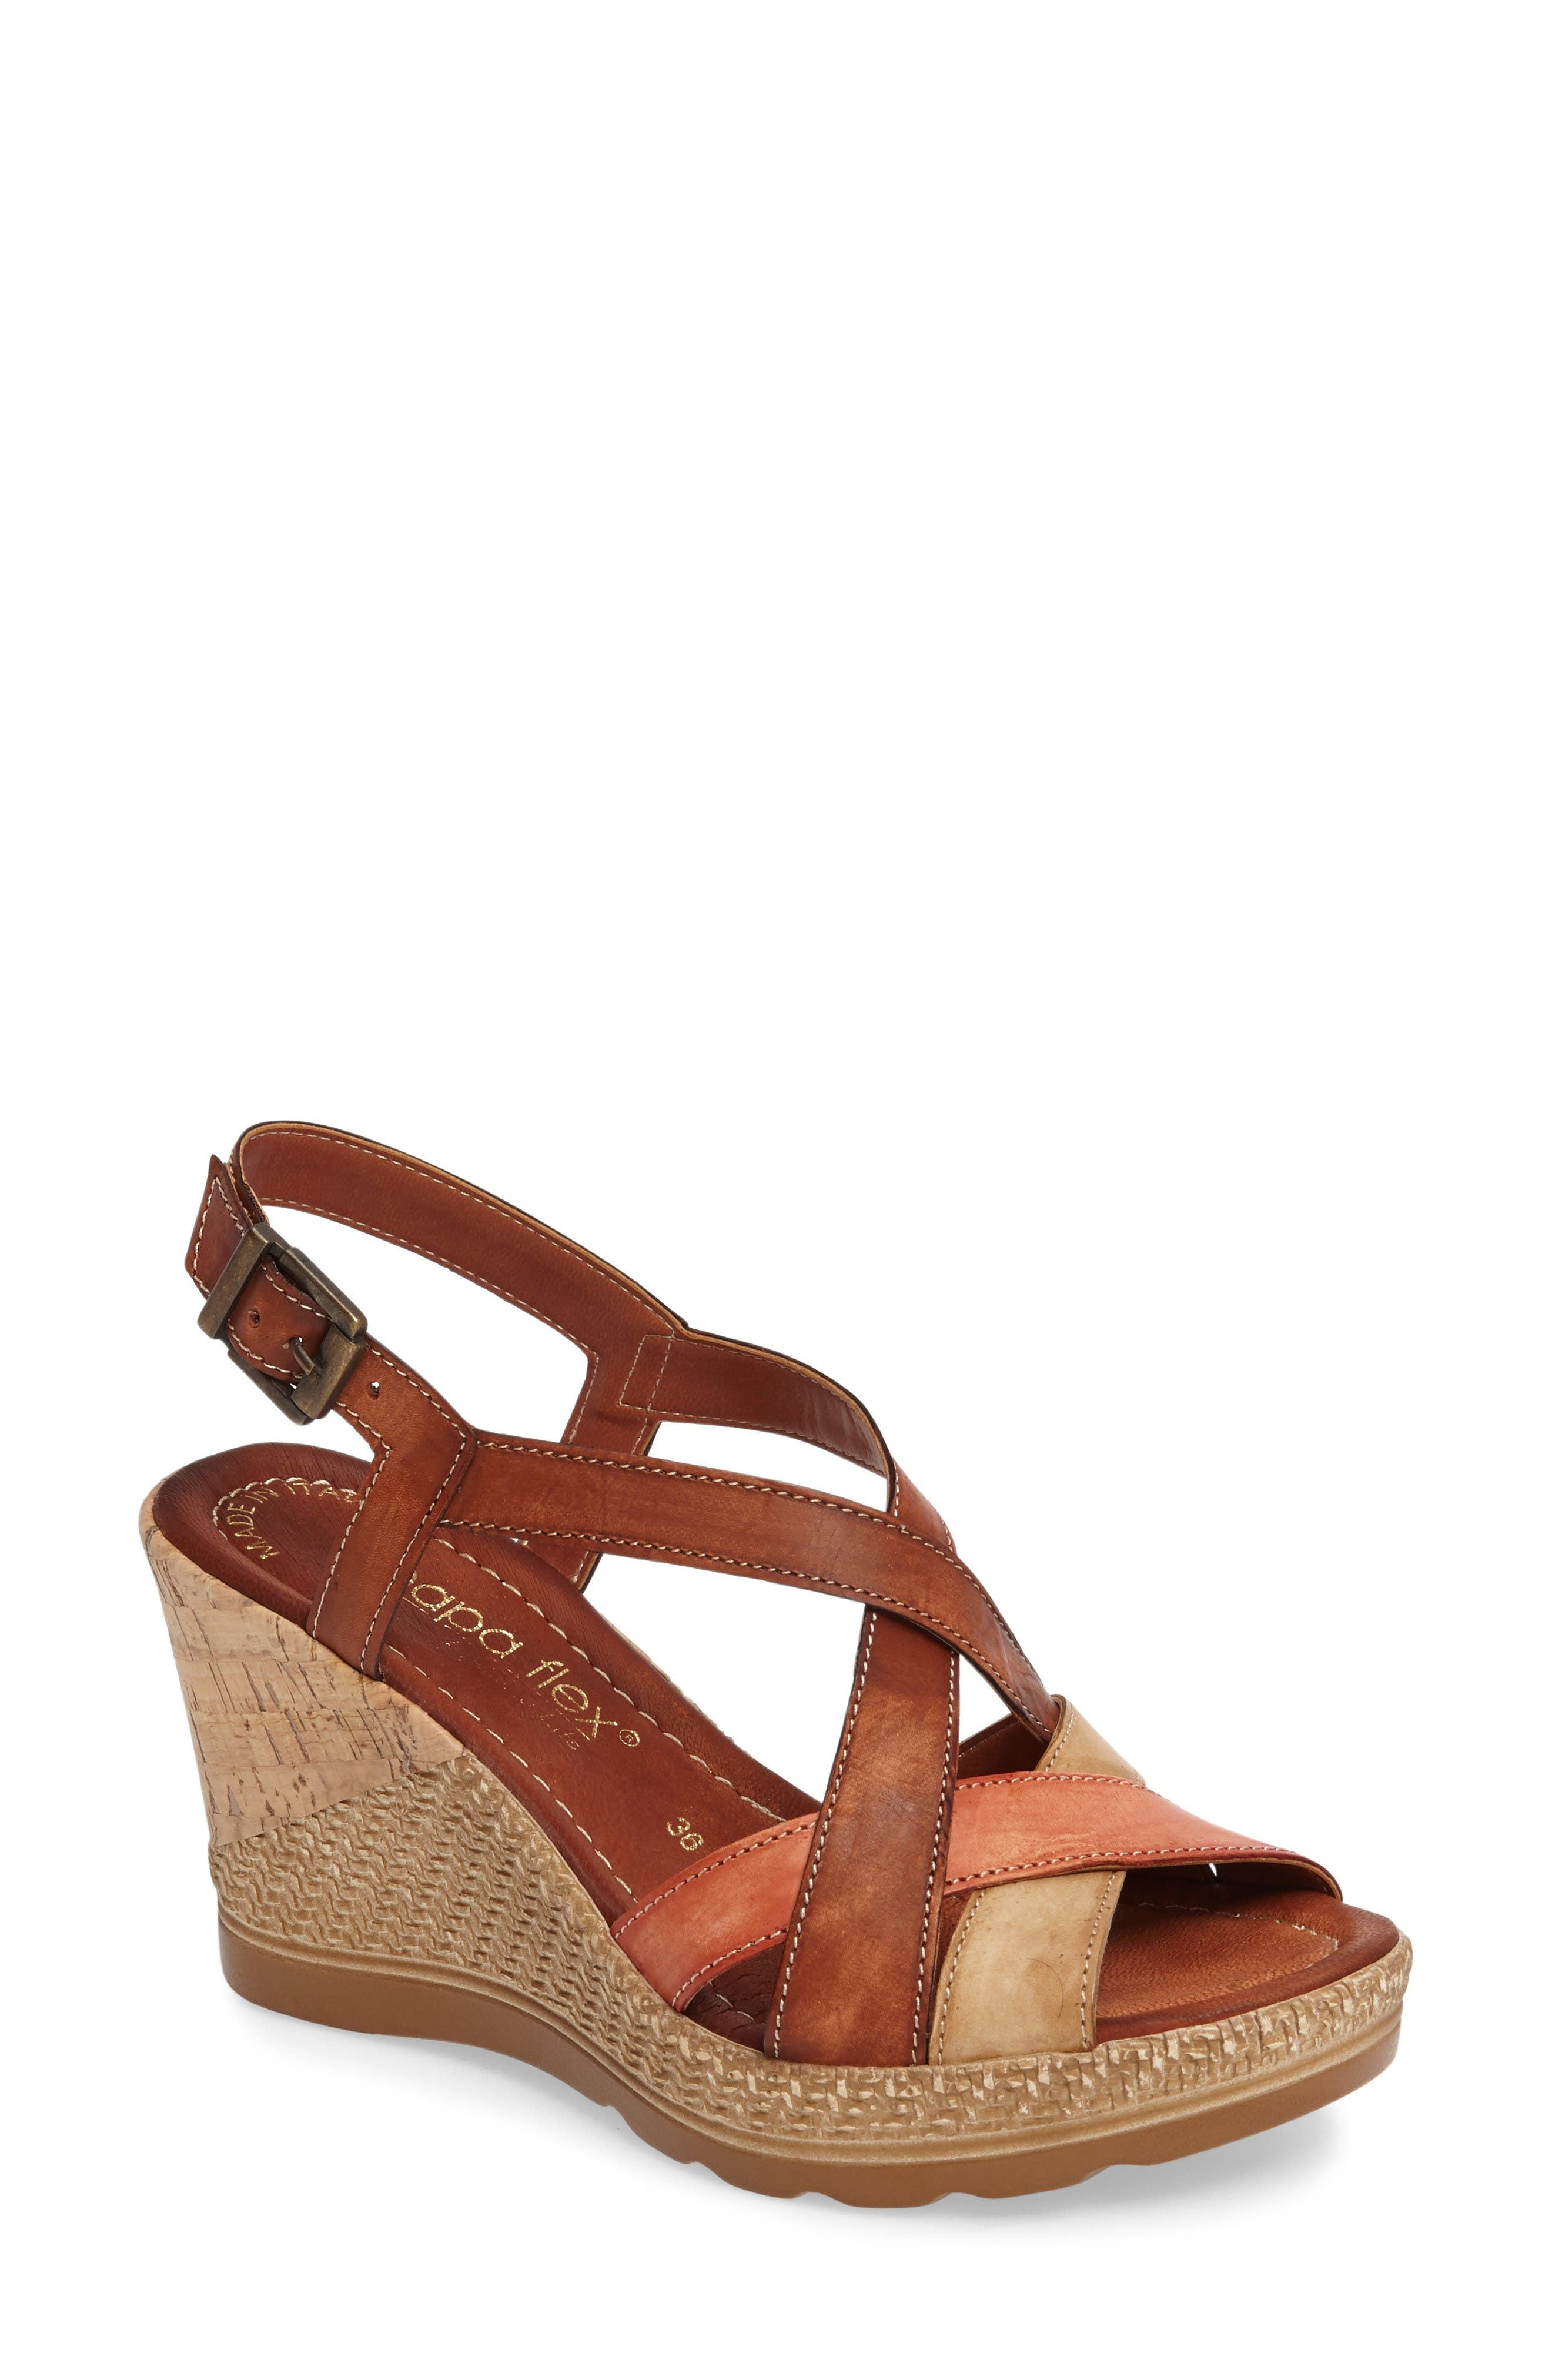 Main Image - Napa Flex Modena Wedge Sandal (Women)